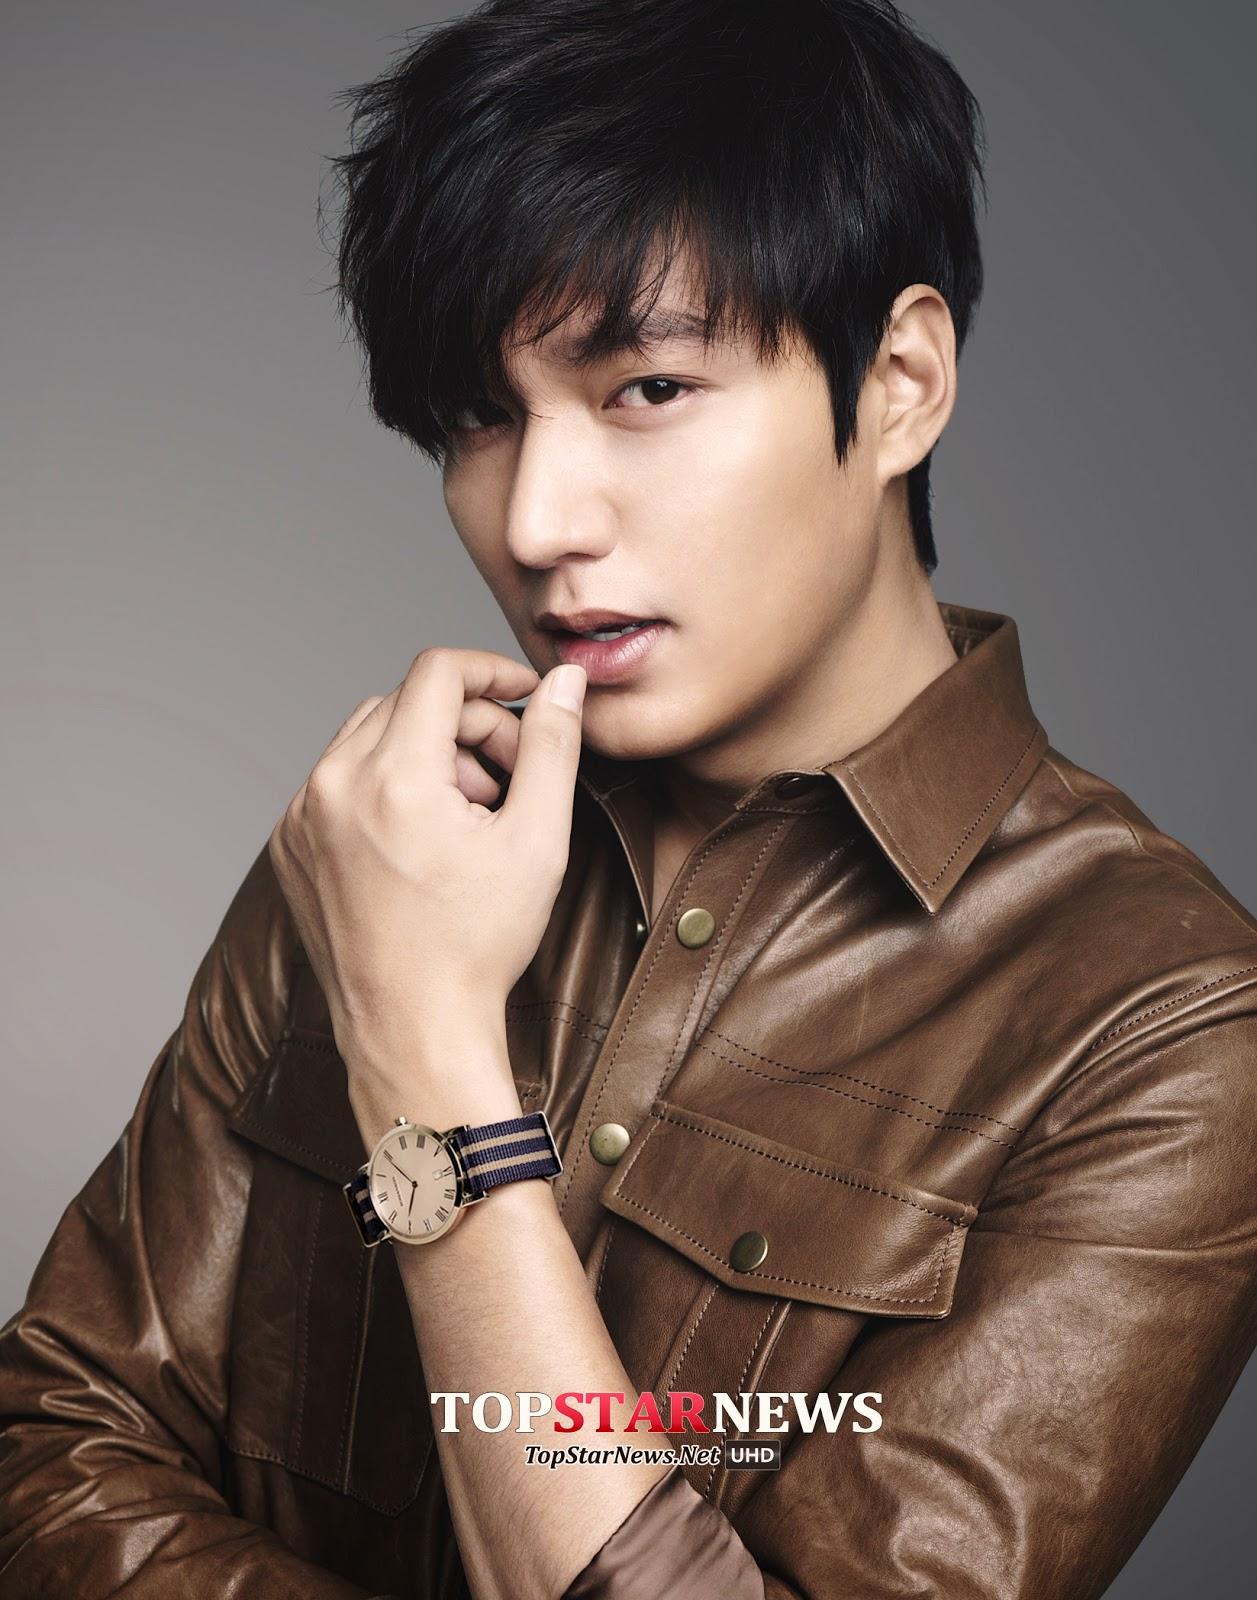 Voshow's Blogger: The best Popular Star( Lee-Min Ho) in Korea